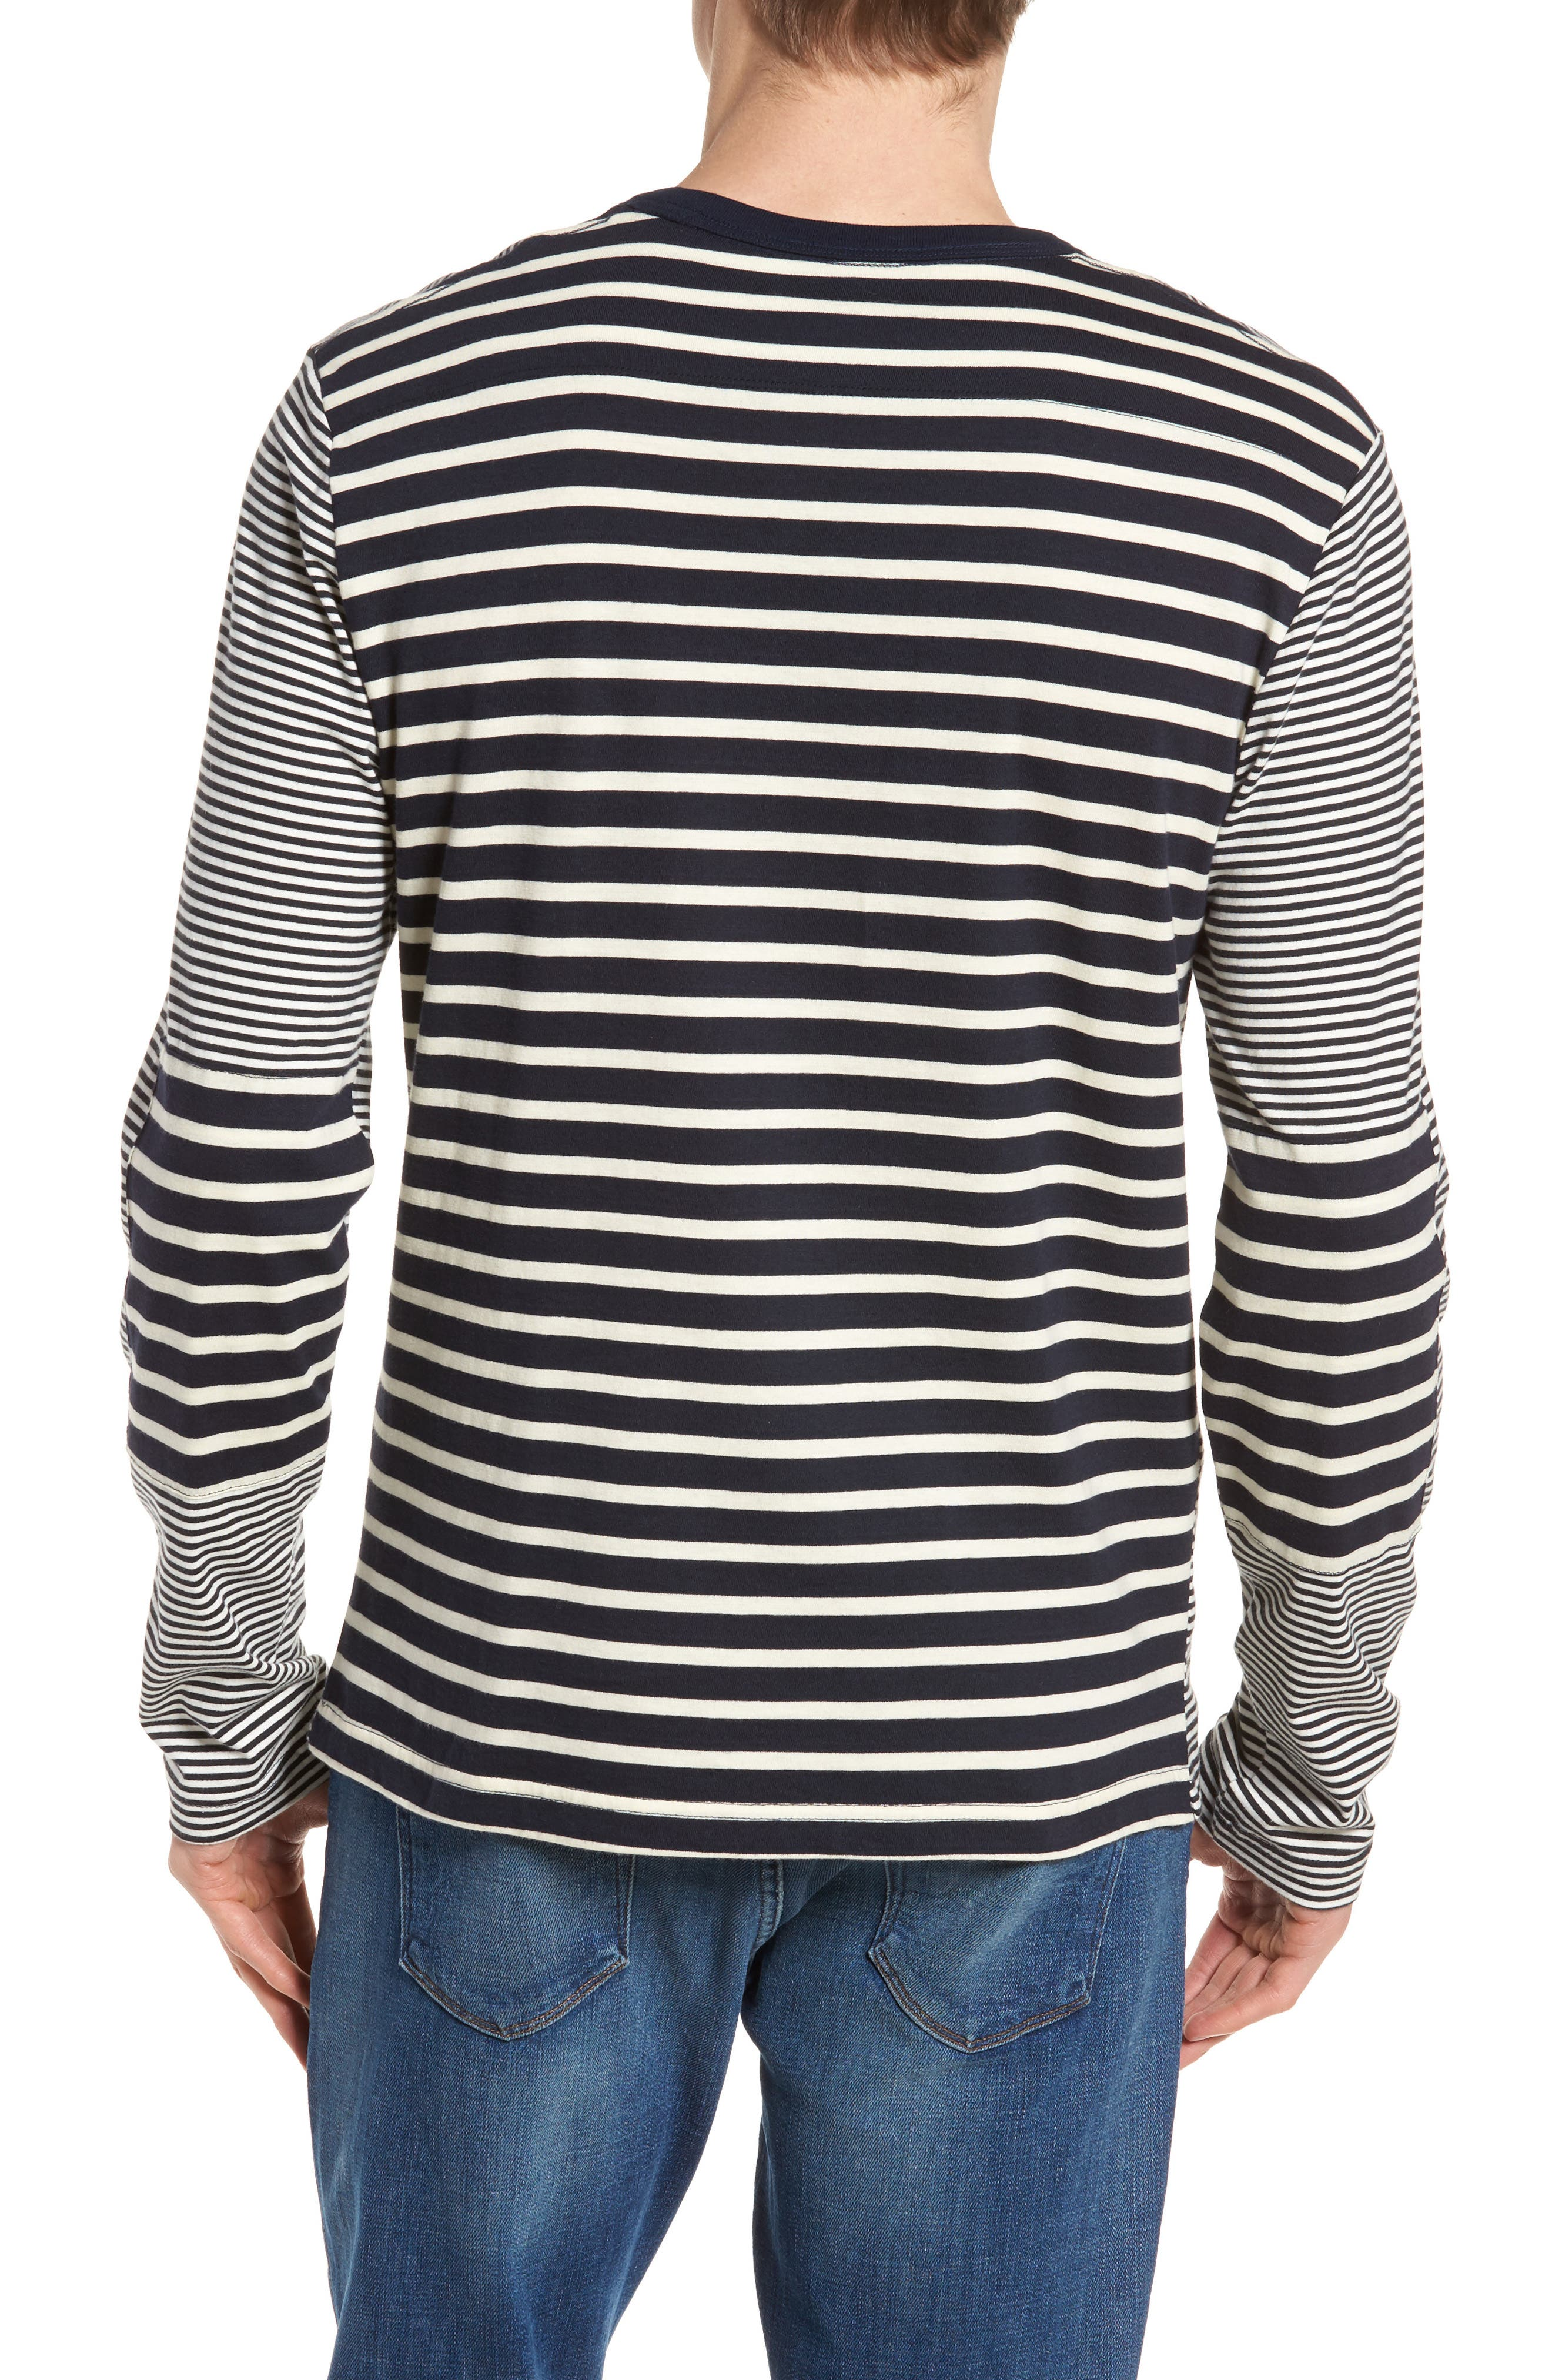 Mix Stripe Long Sleeve T-Shirt,                             Alternate thumbnail 2, color,                             Turtle Dove/ Marine Blue